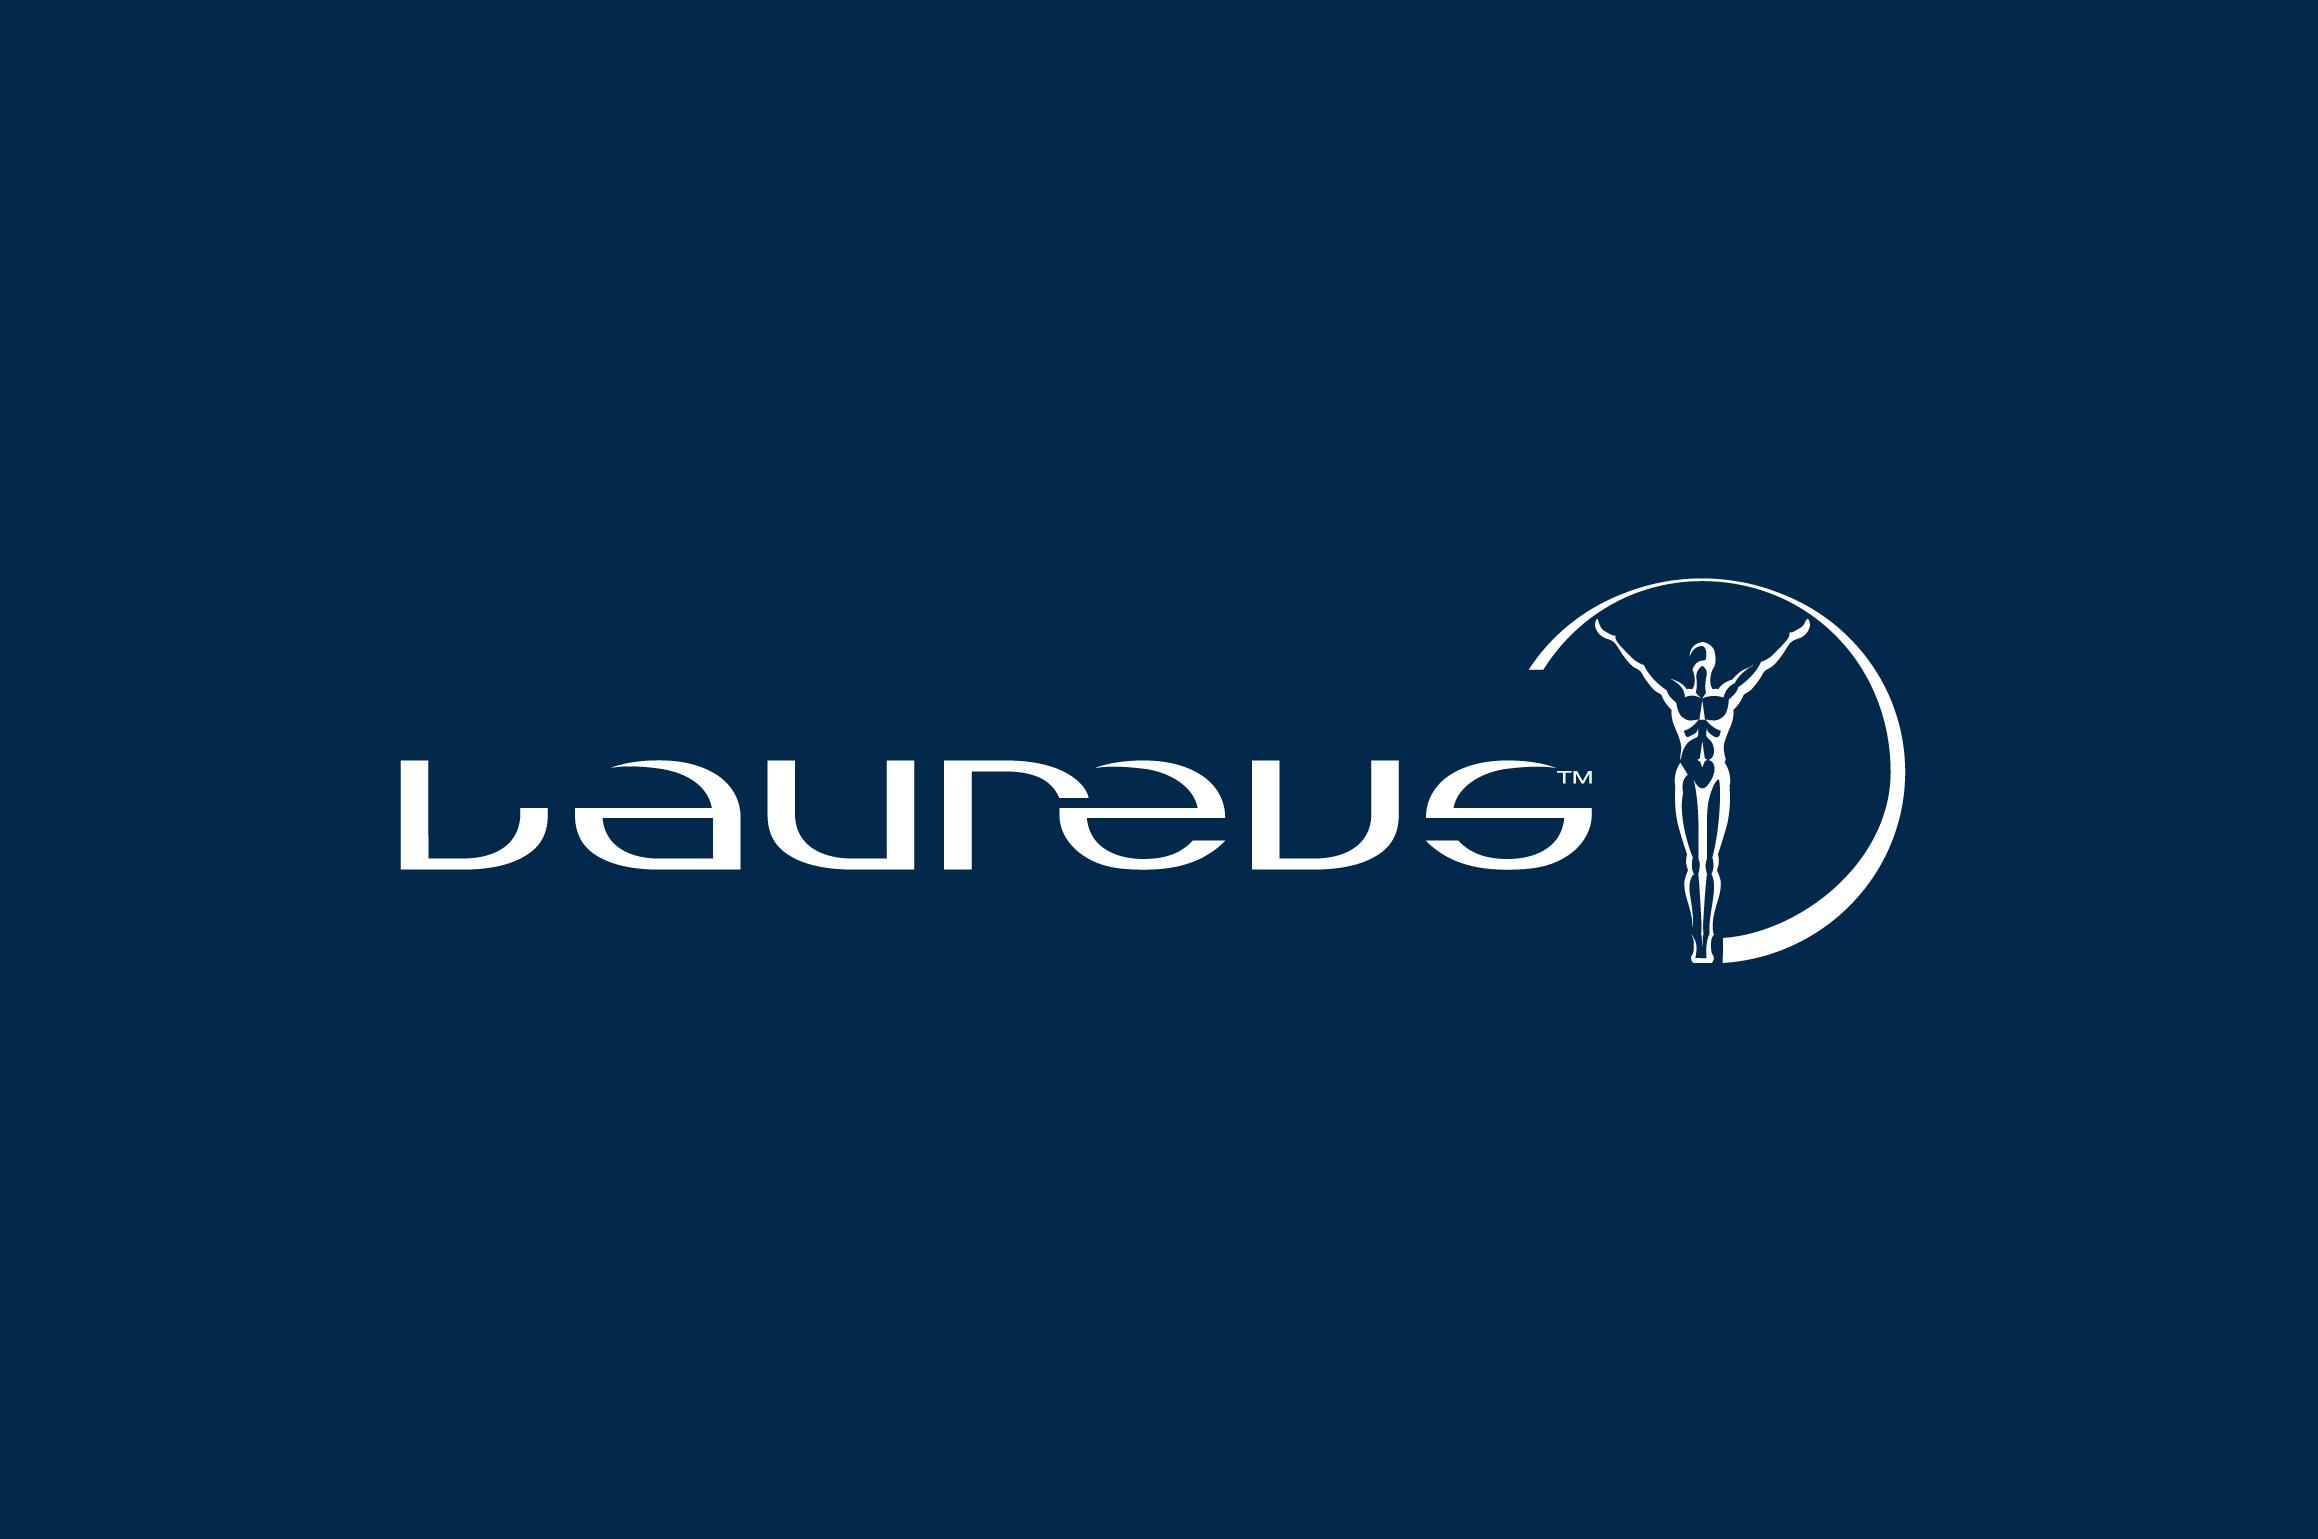 www.laureus.com